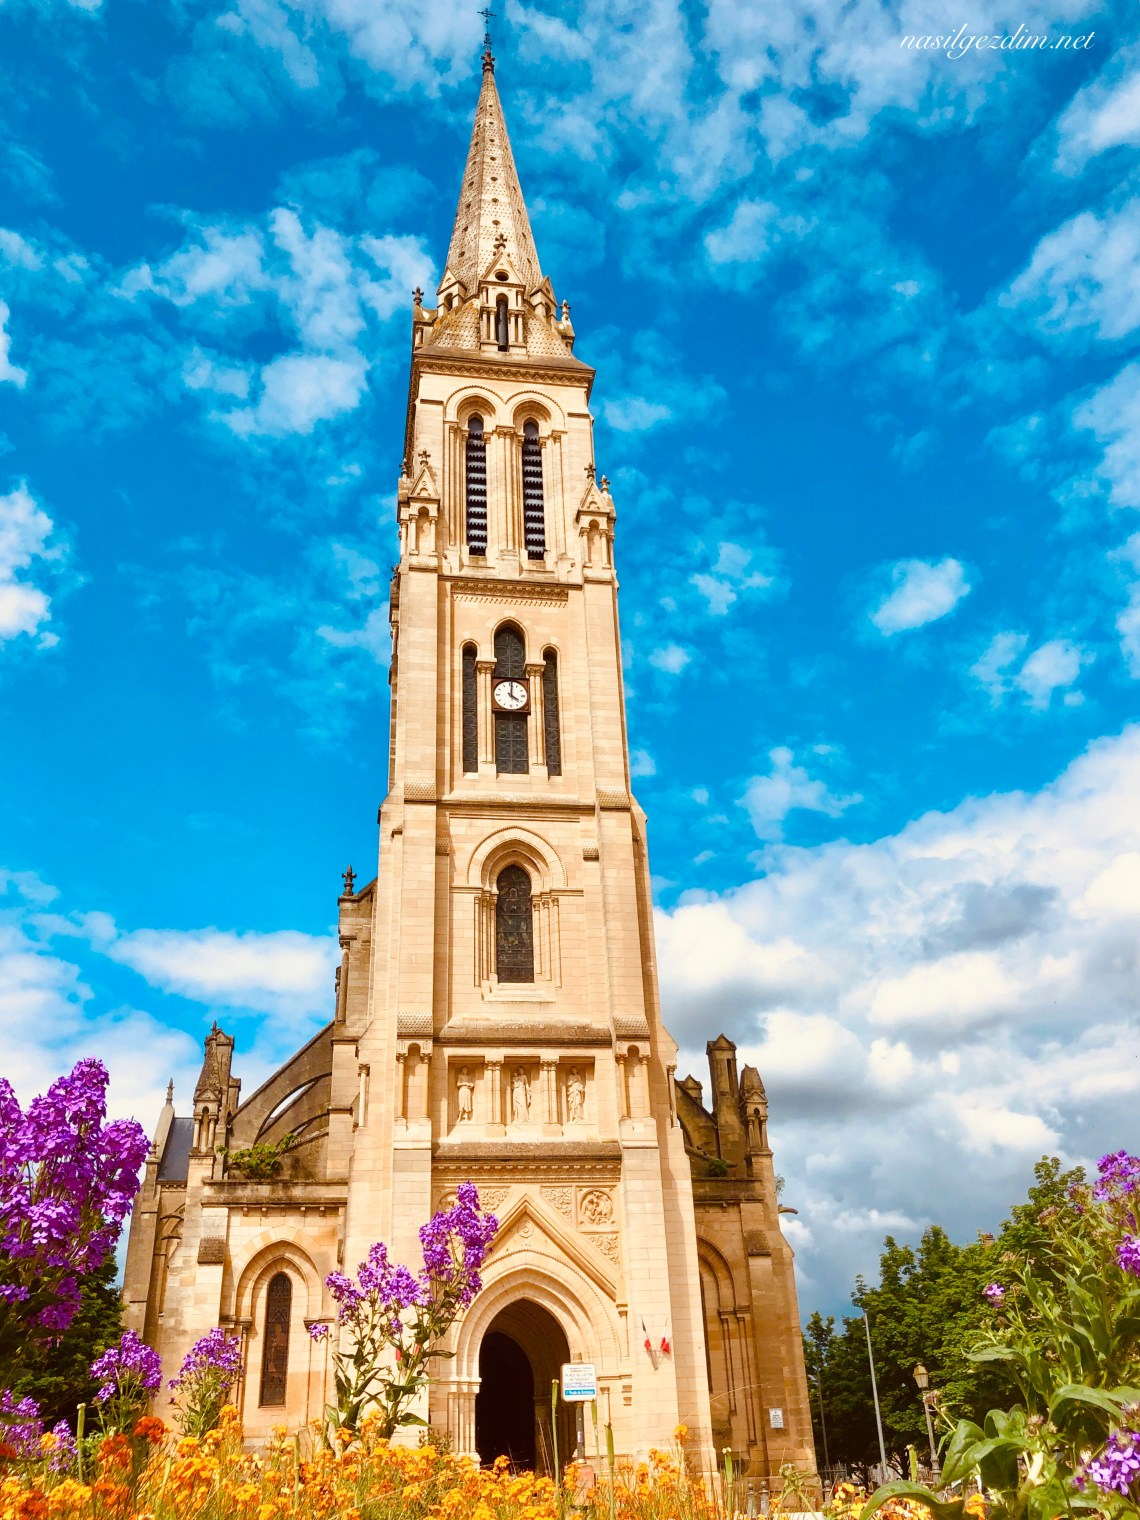 Bergerac nerede, bergerac gezi rehberi, bergerac gezilecek yerler, Fransa gezilecek yerler, Fransa gezi rehberi